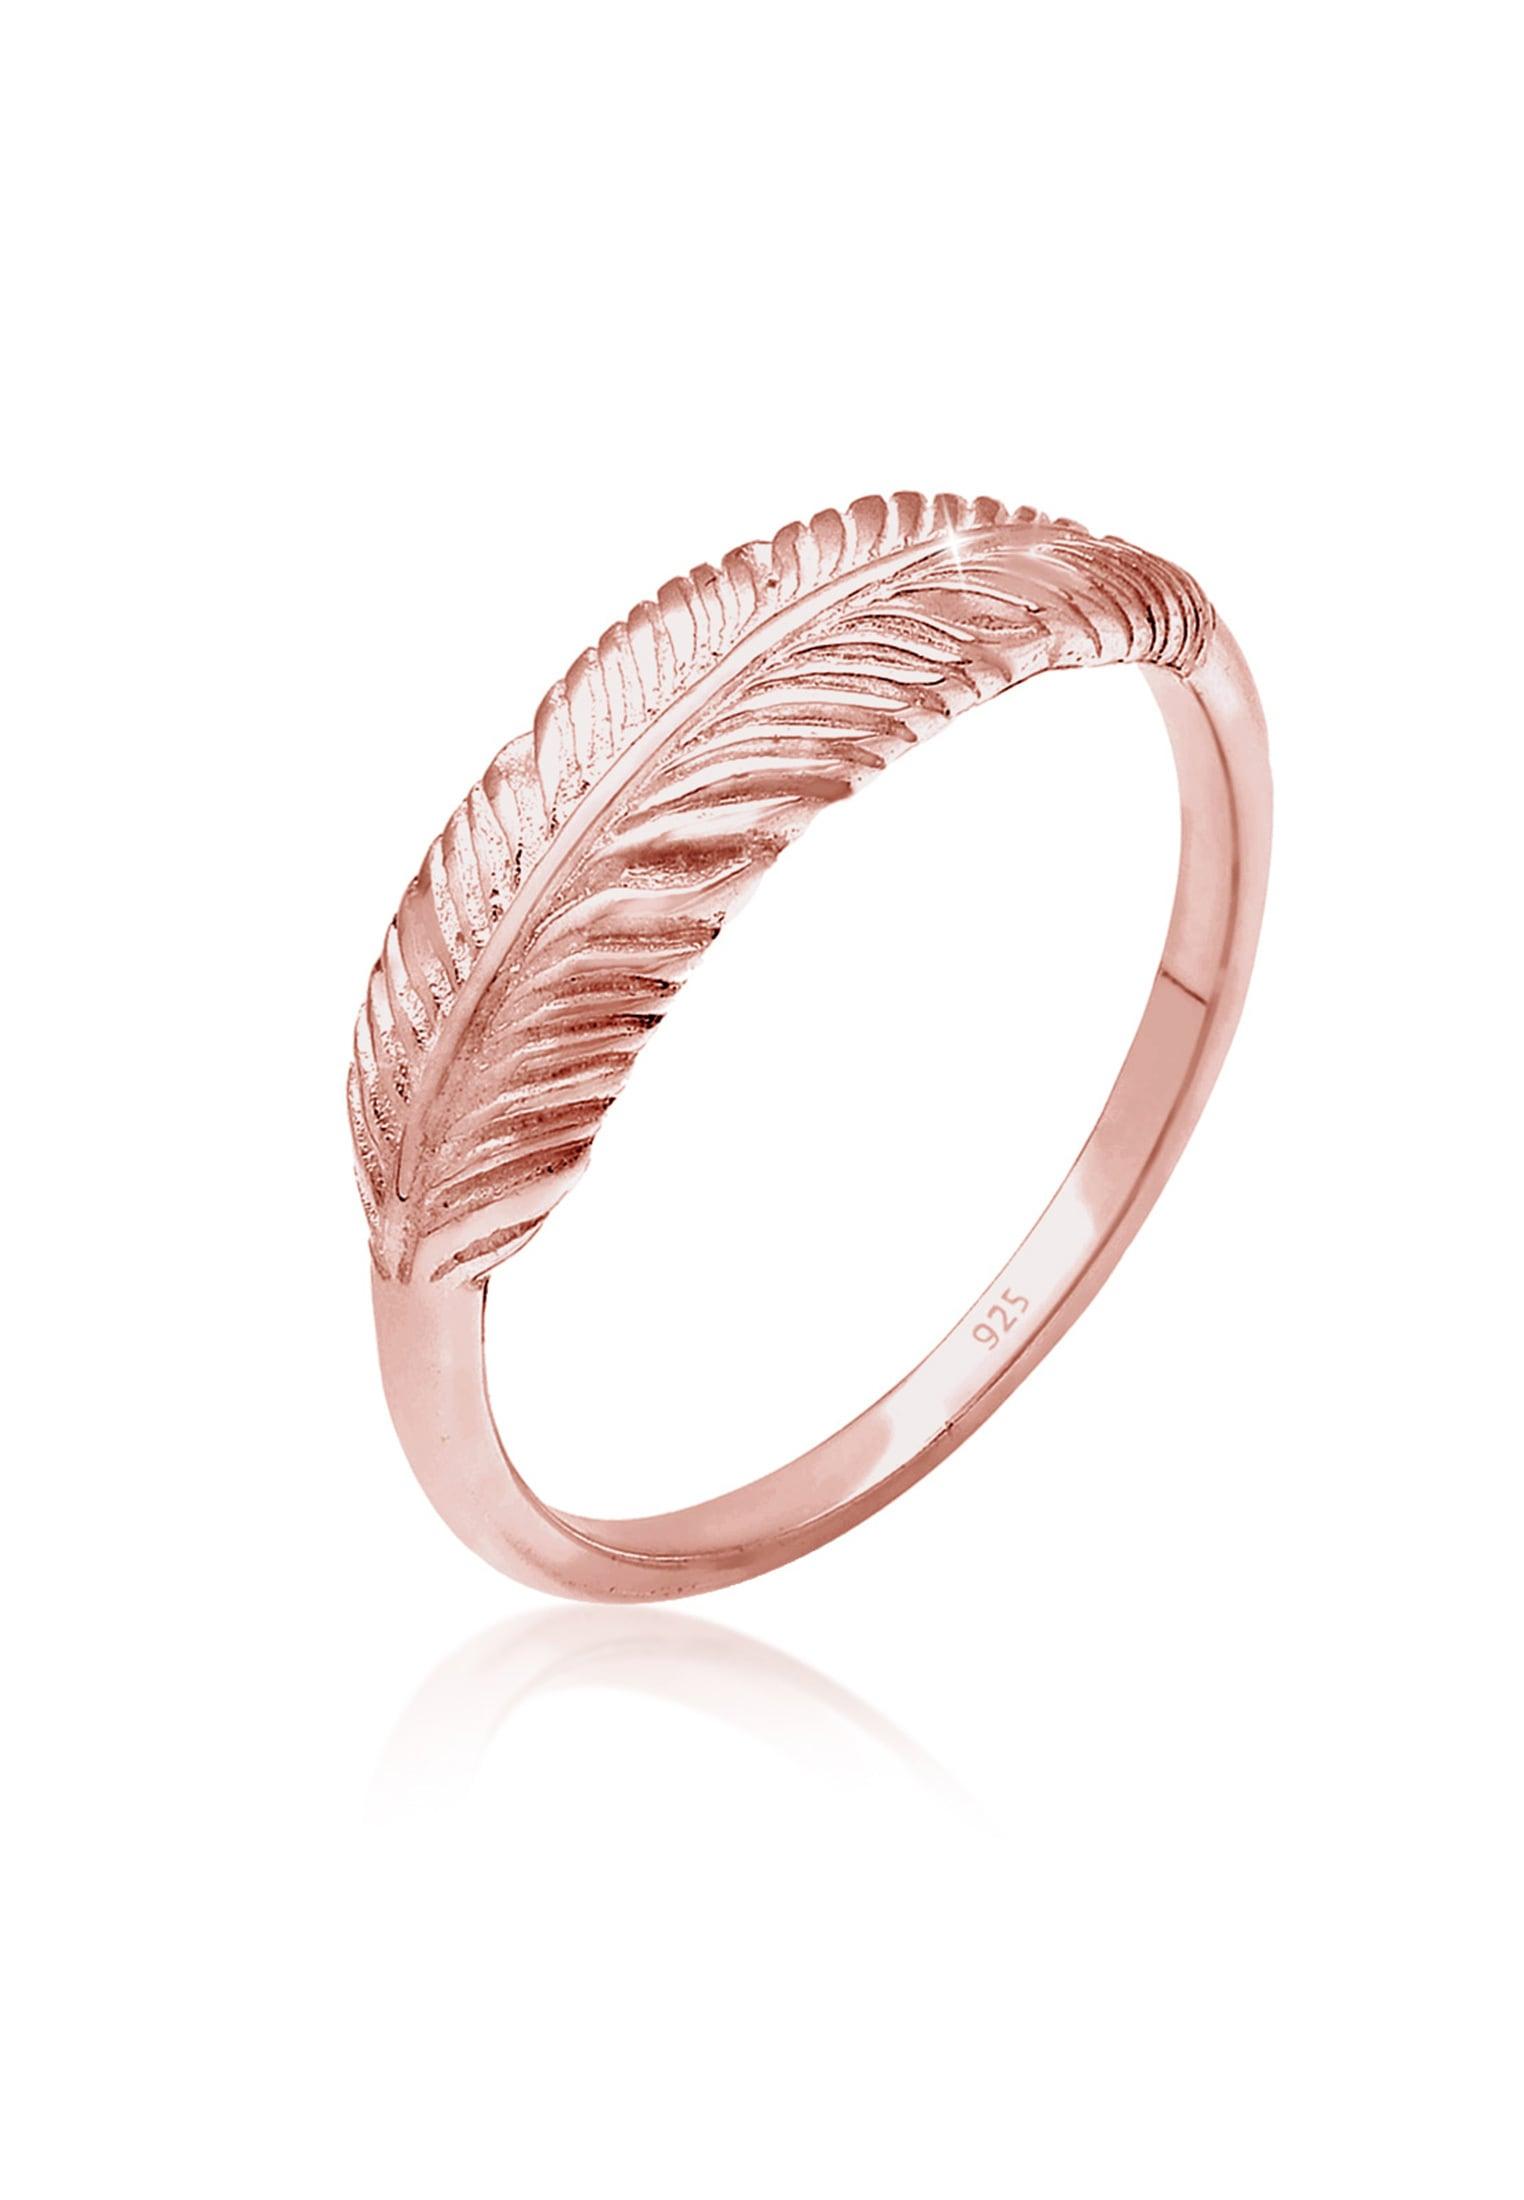 Elli Fingerring Silberring Feder 925 Sterling Silber | Schmuck > Ringe > Fingerringe | Goldfarben | Elli